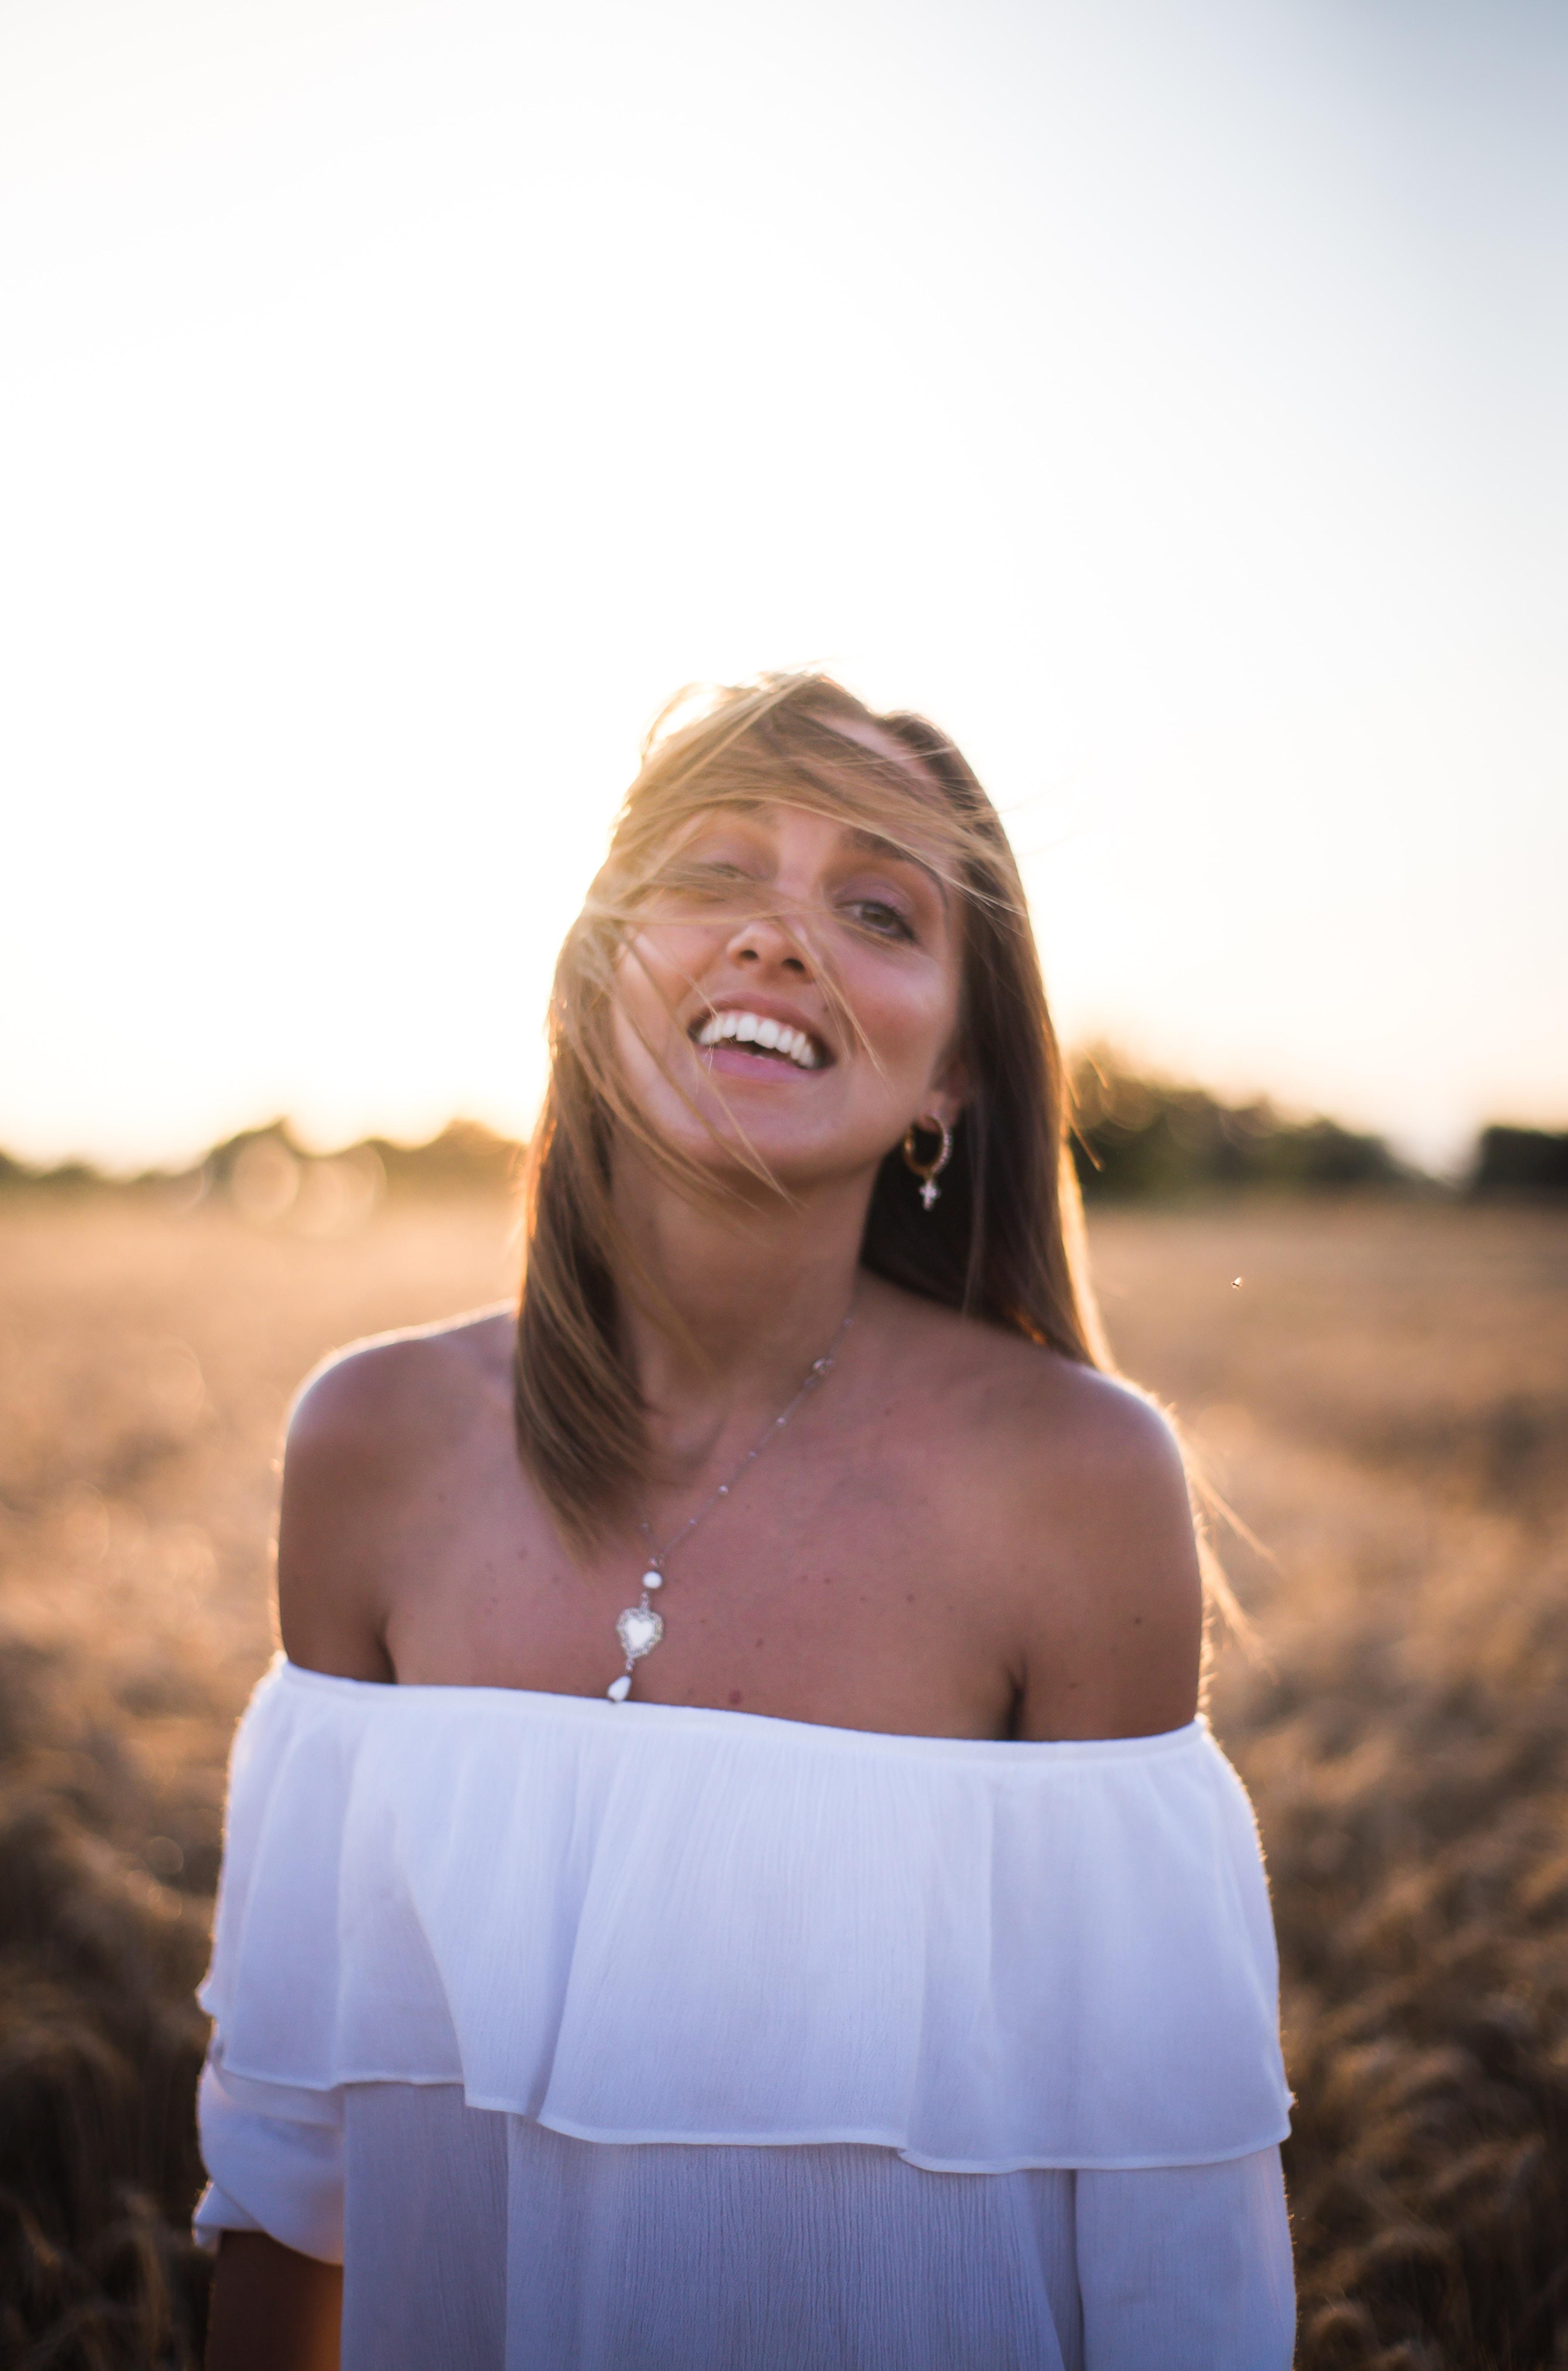 photo of smiling woman wearing white tube-top dress